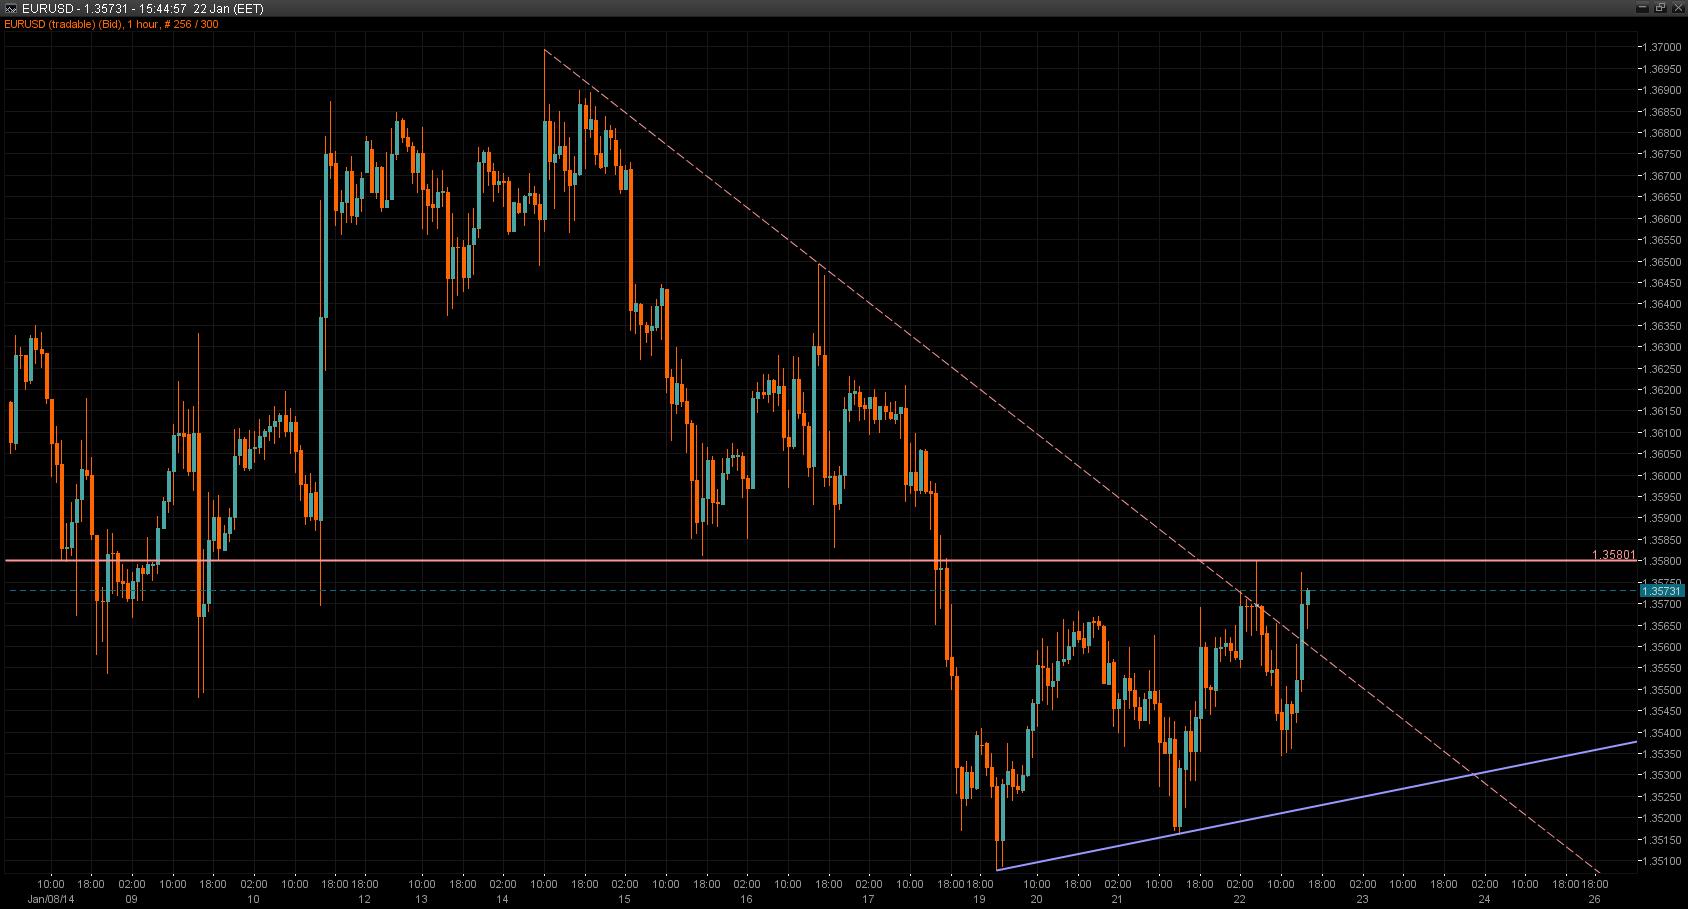 EUR/USD Chart 22 Jan 2014